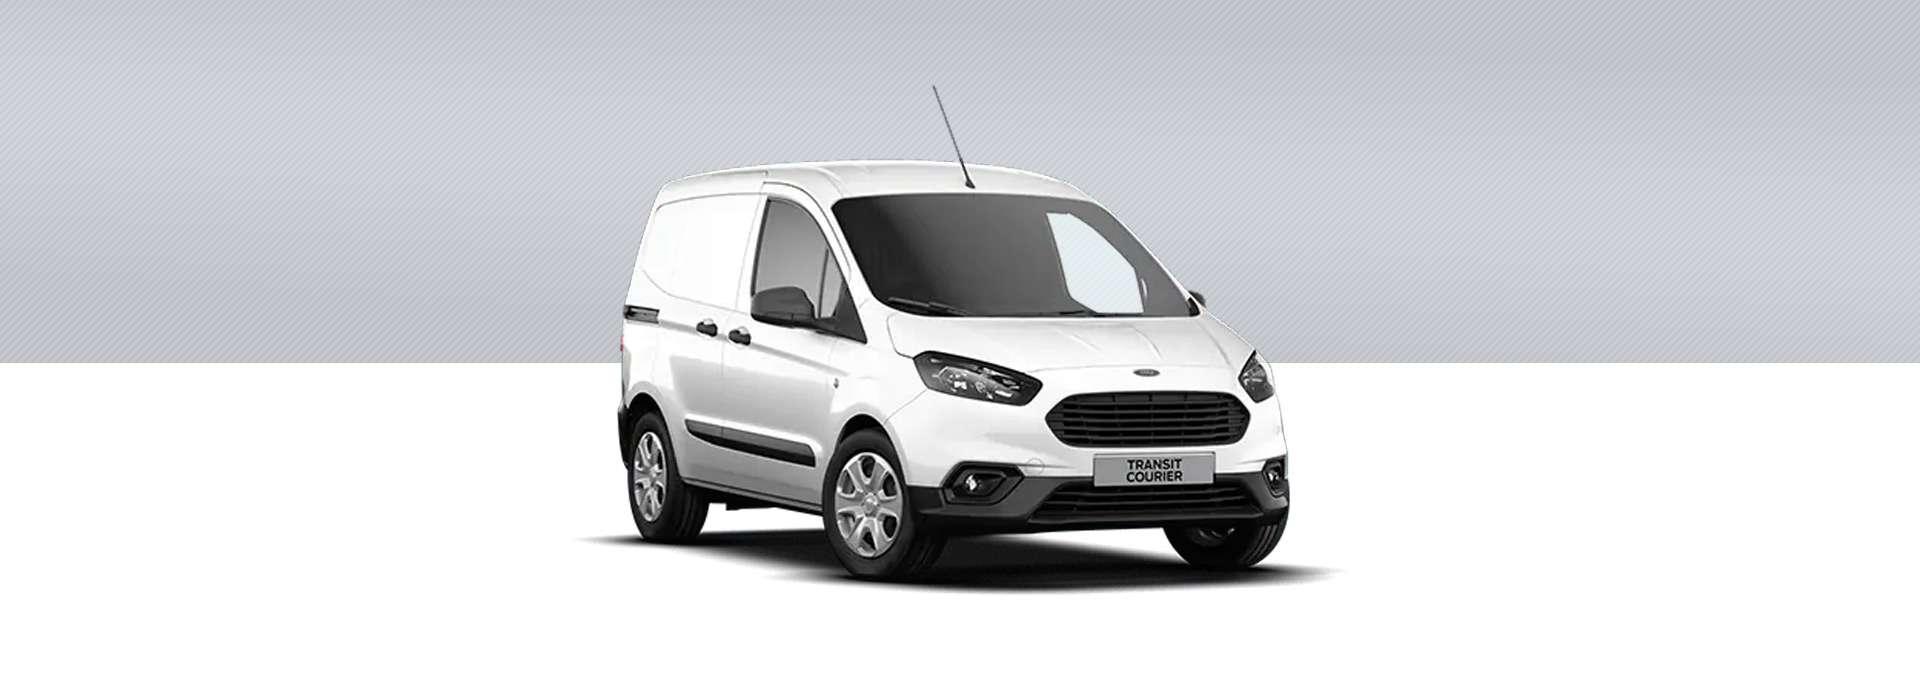 Ford Transit Courier Van